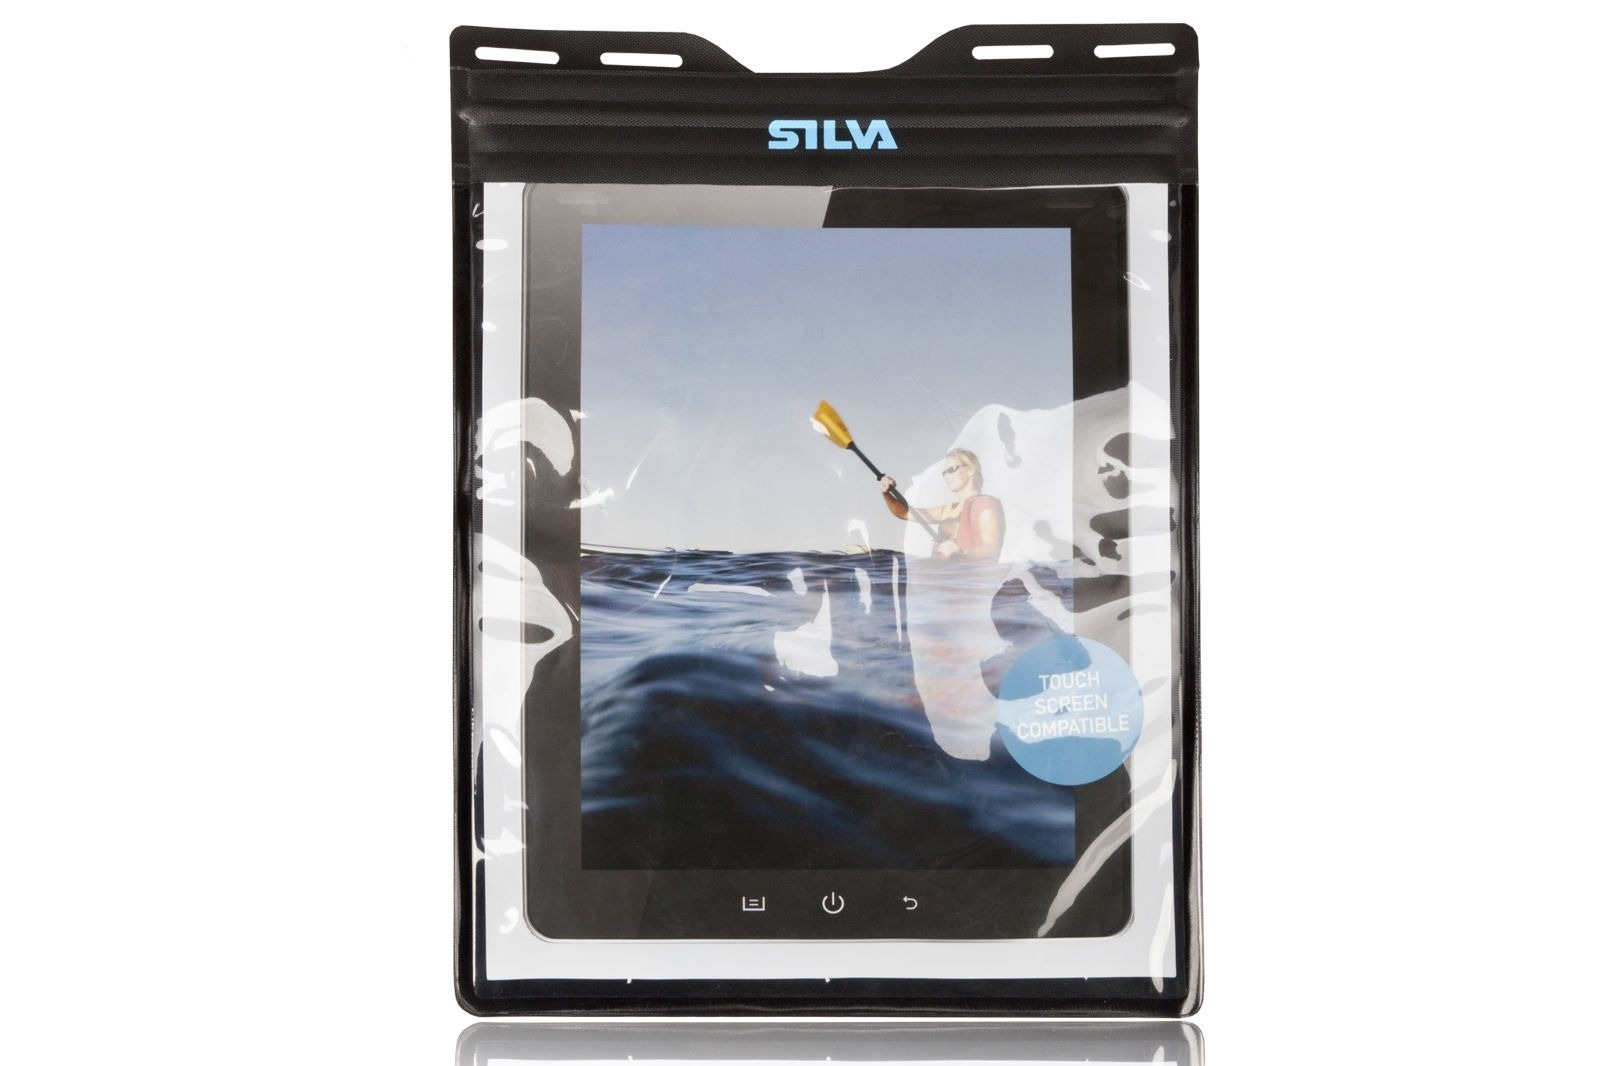 Image of Etui wodoodporne na tablet silva dry case l